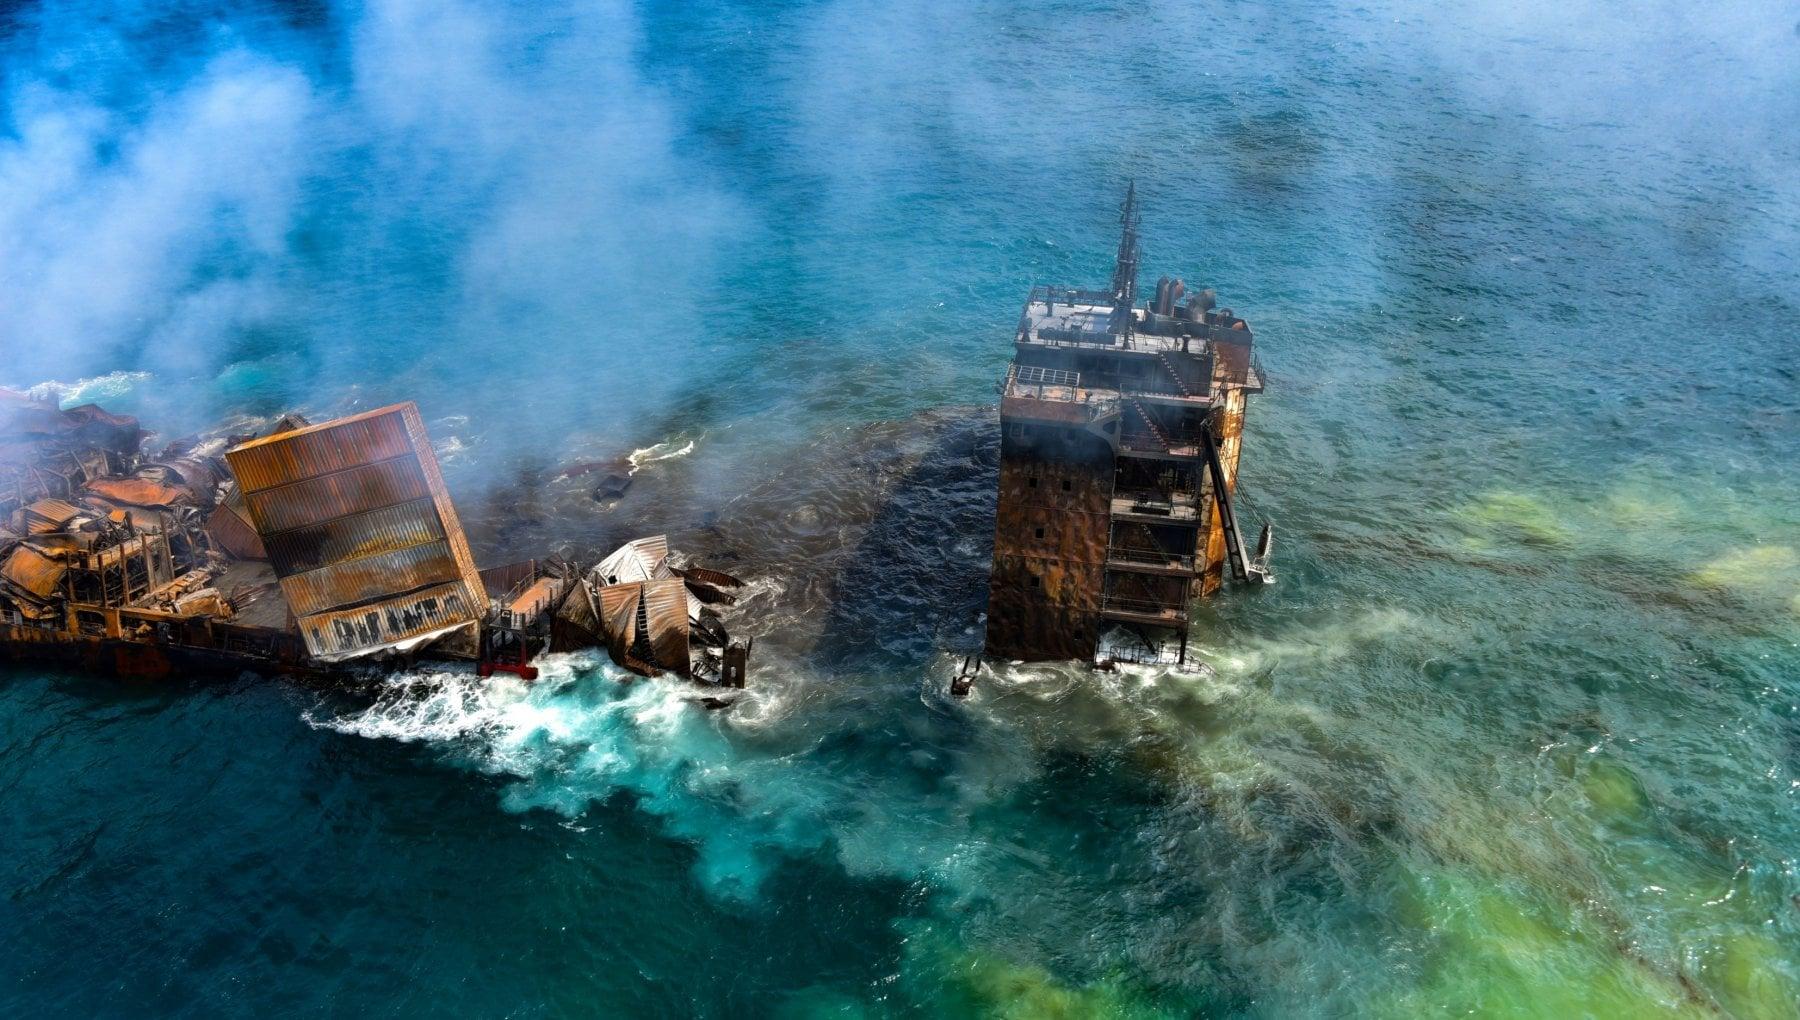 202903437 d316607c 5239 4424 b905 2da9e177af19 - Sri Lanka, disastro ambientale: affonda il cargo dei veleni